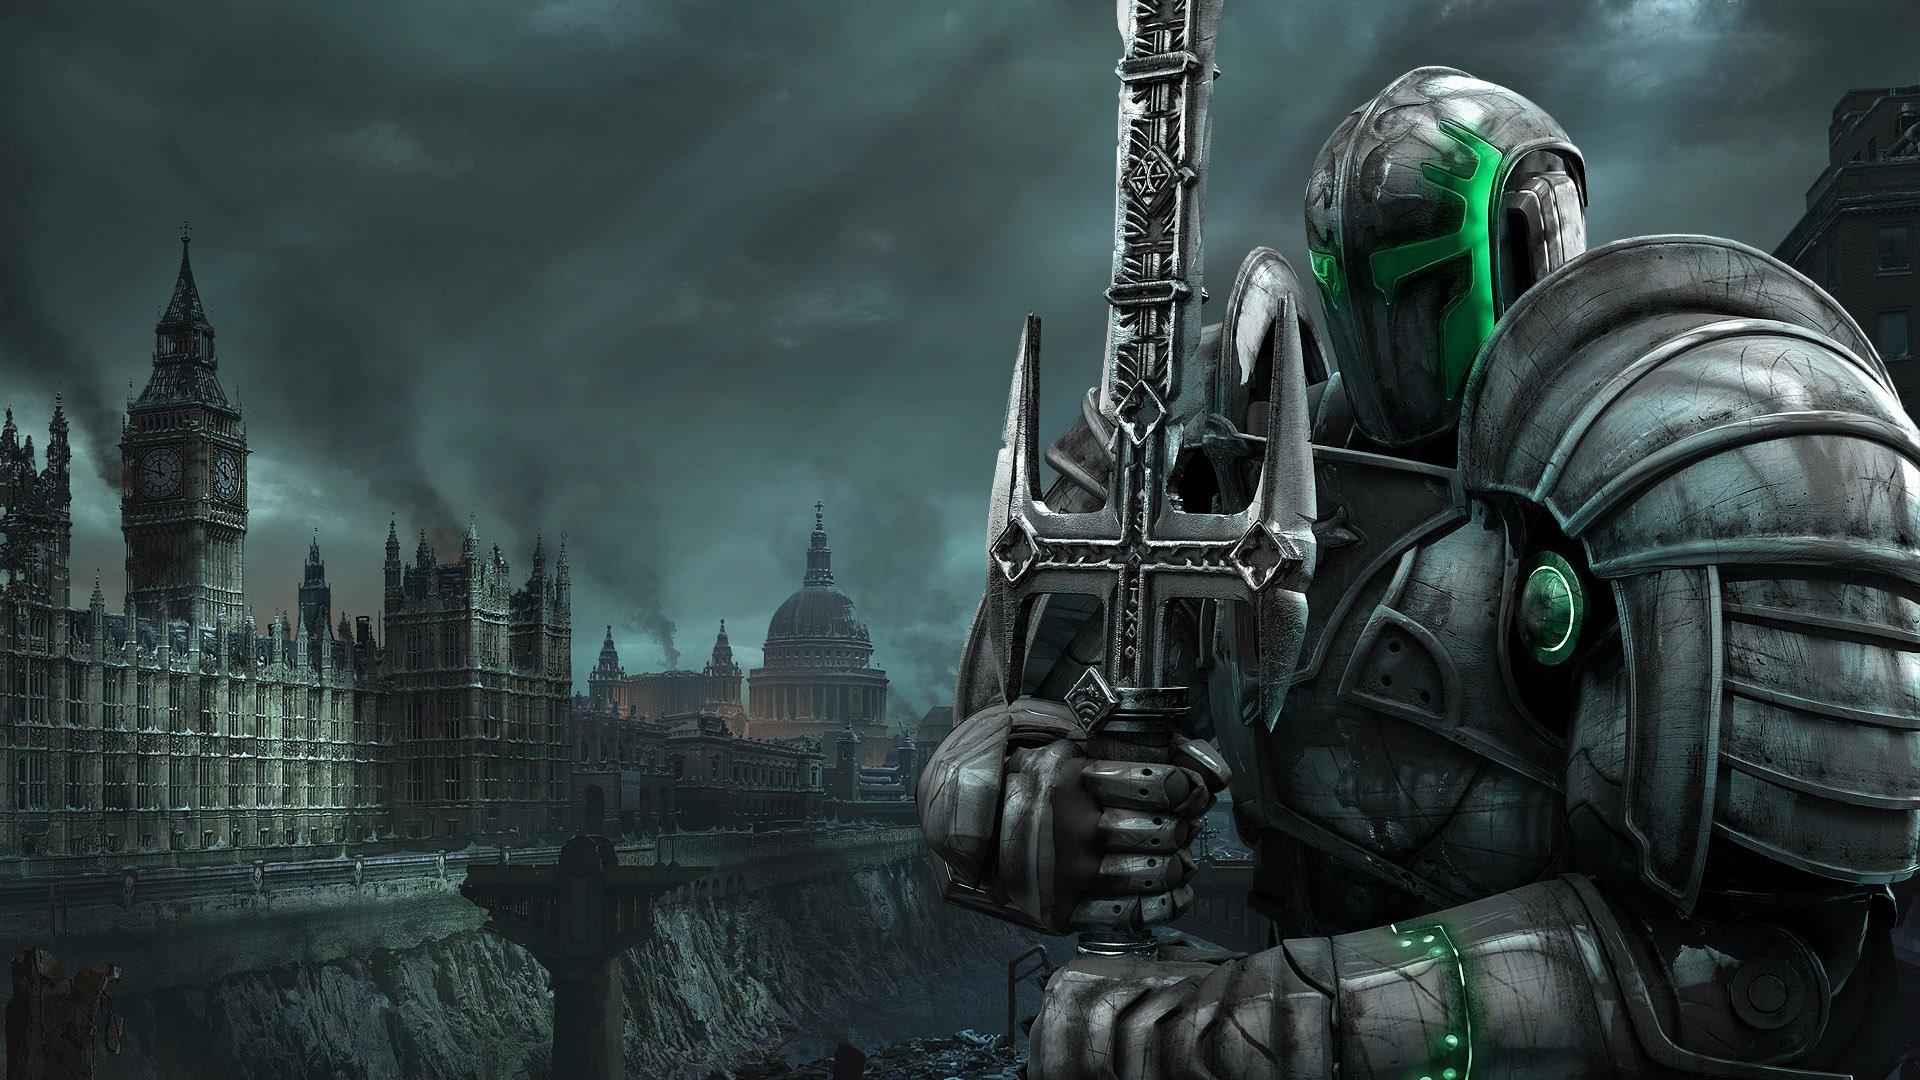 sci fi warrior knight armor city apocalyptic wallpaper background 1920x1080